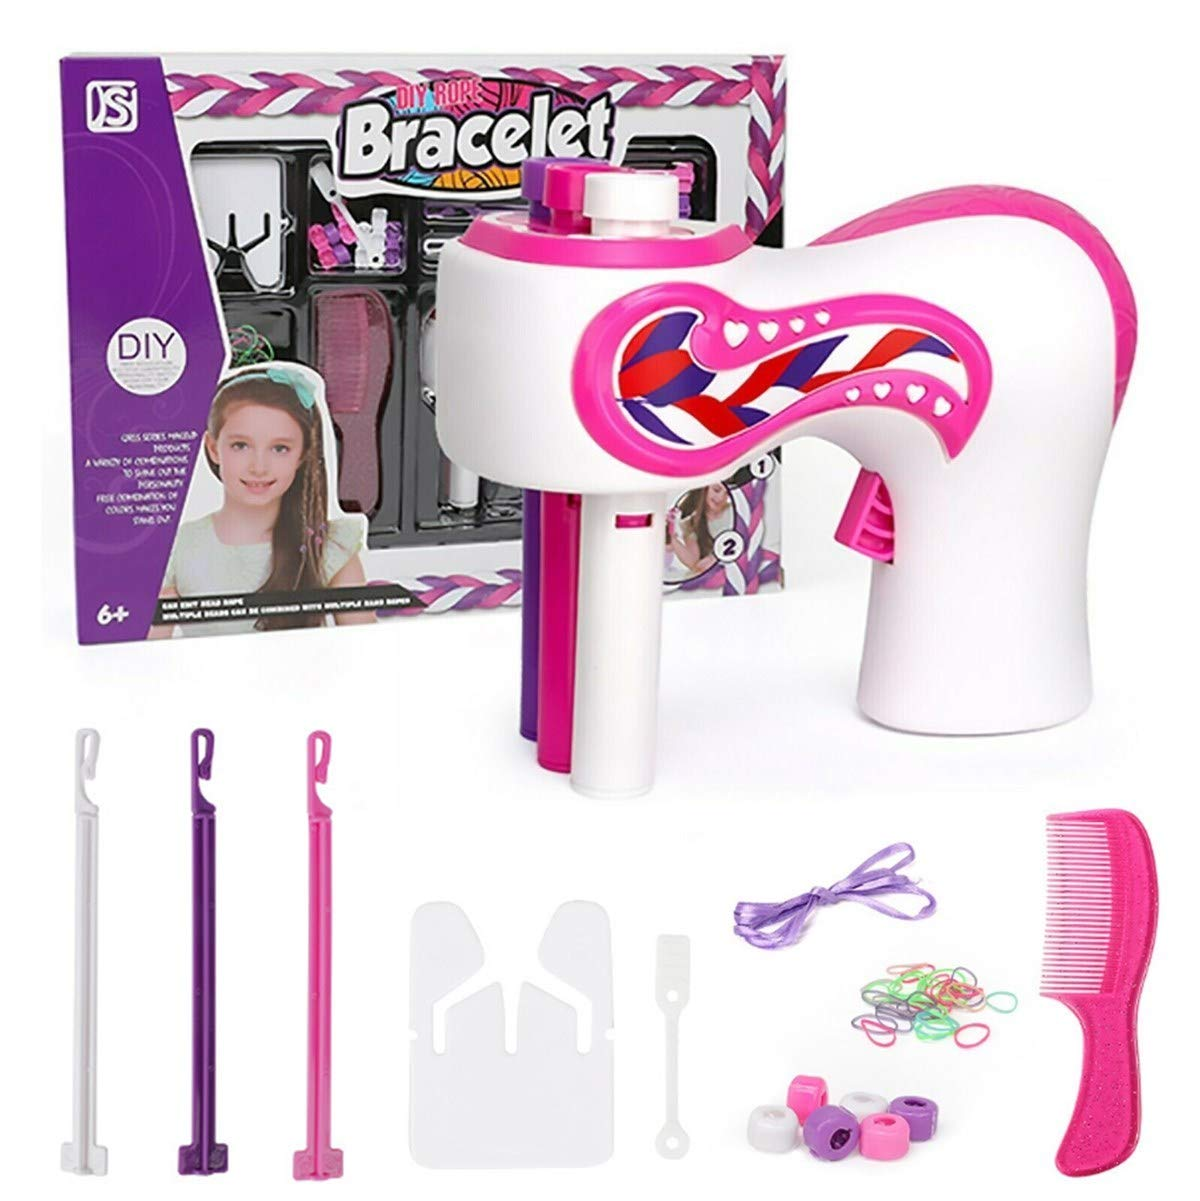 Automatic Braid Electric Braiding Machine,3-Strand Braid Machine,Diy Braid Set Hairdressing Decoration,One-Click Start, Fashionable Braiding Hairstyle Tool Girl Gift